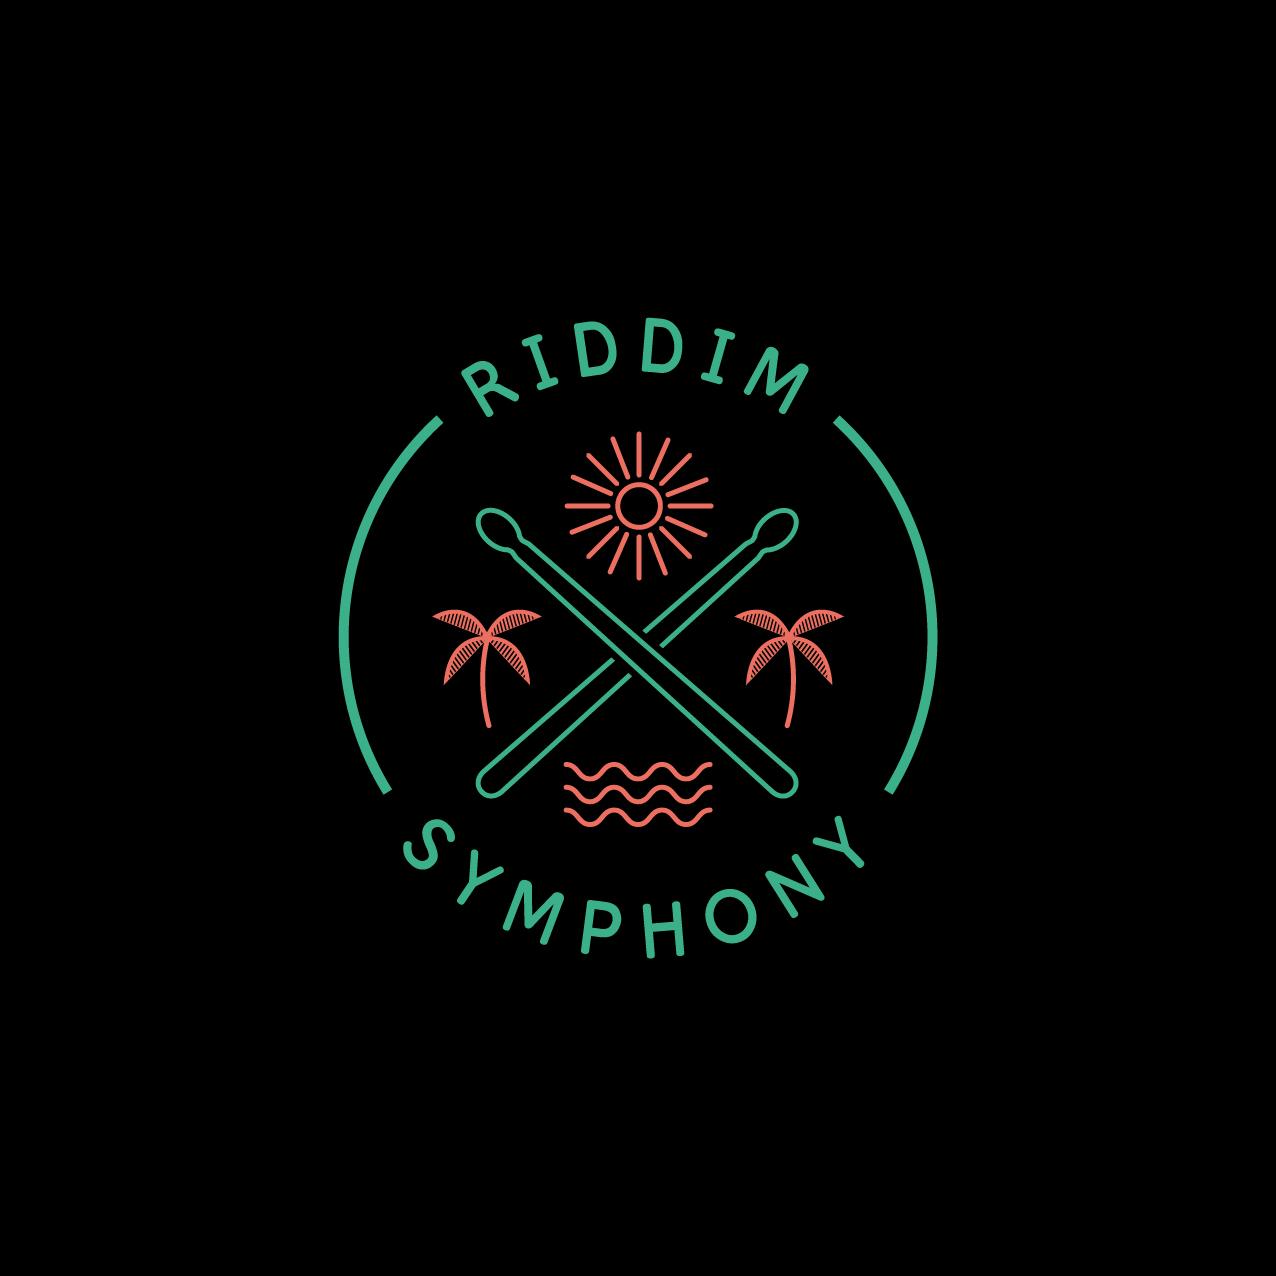 Riddim-Symphony-Logo-ideas-squarespace-b-01.jpg